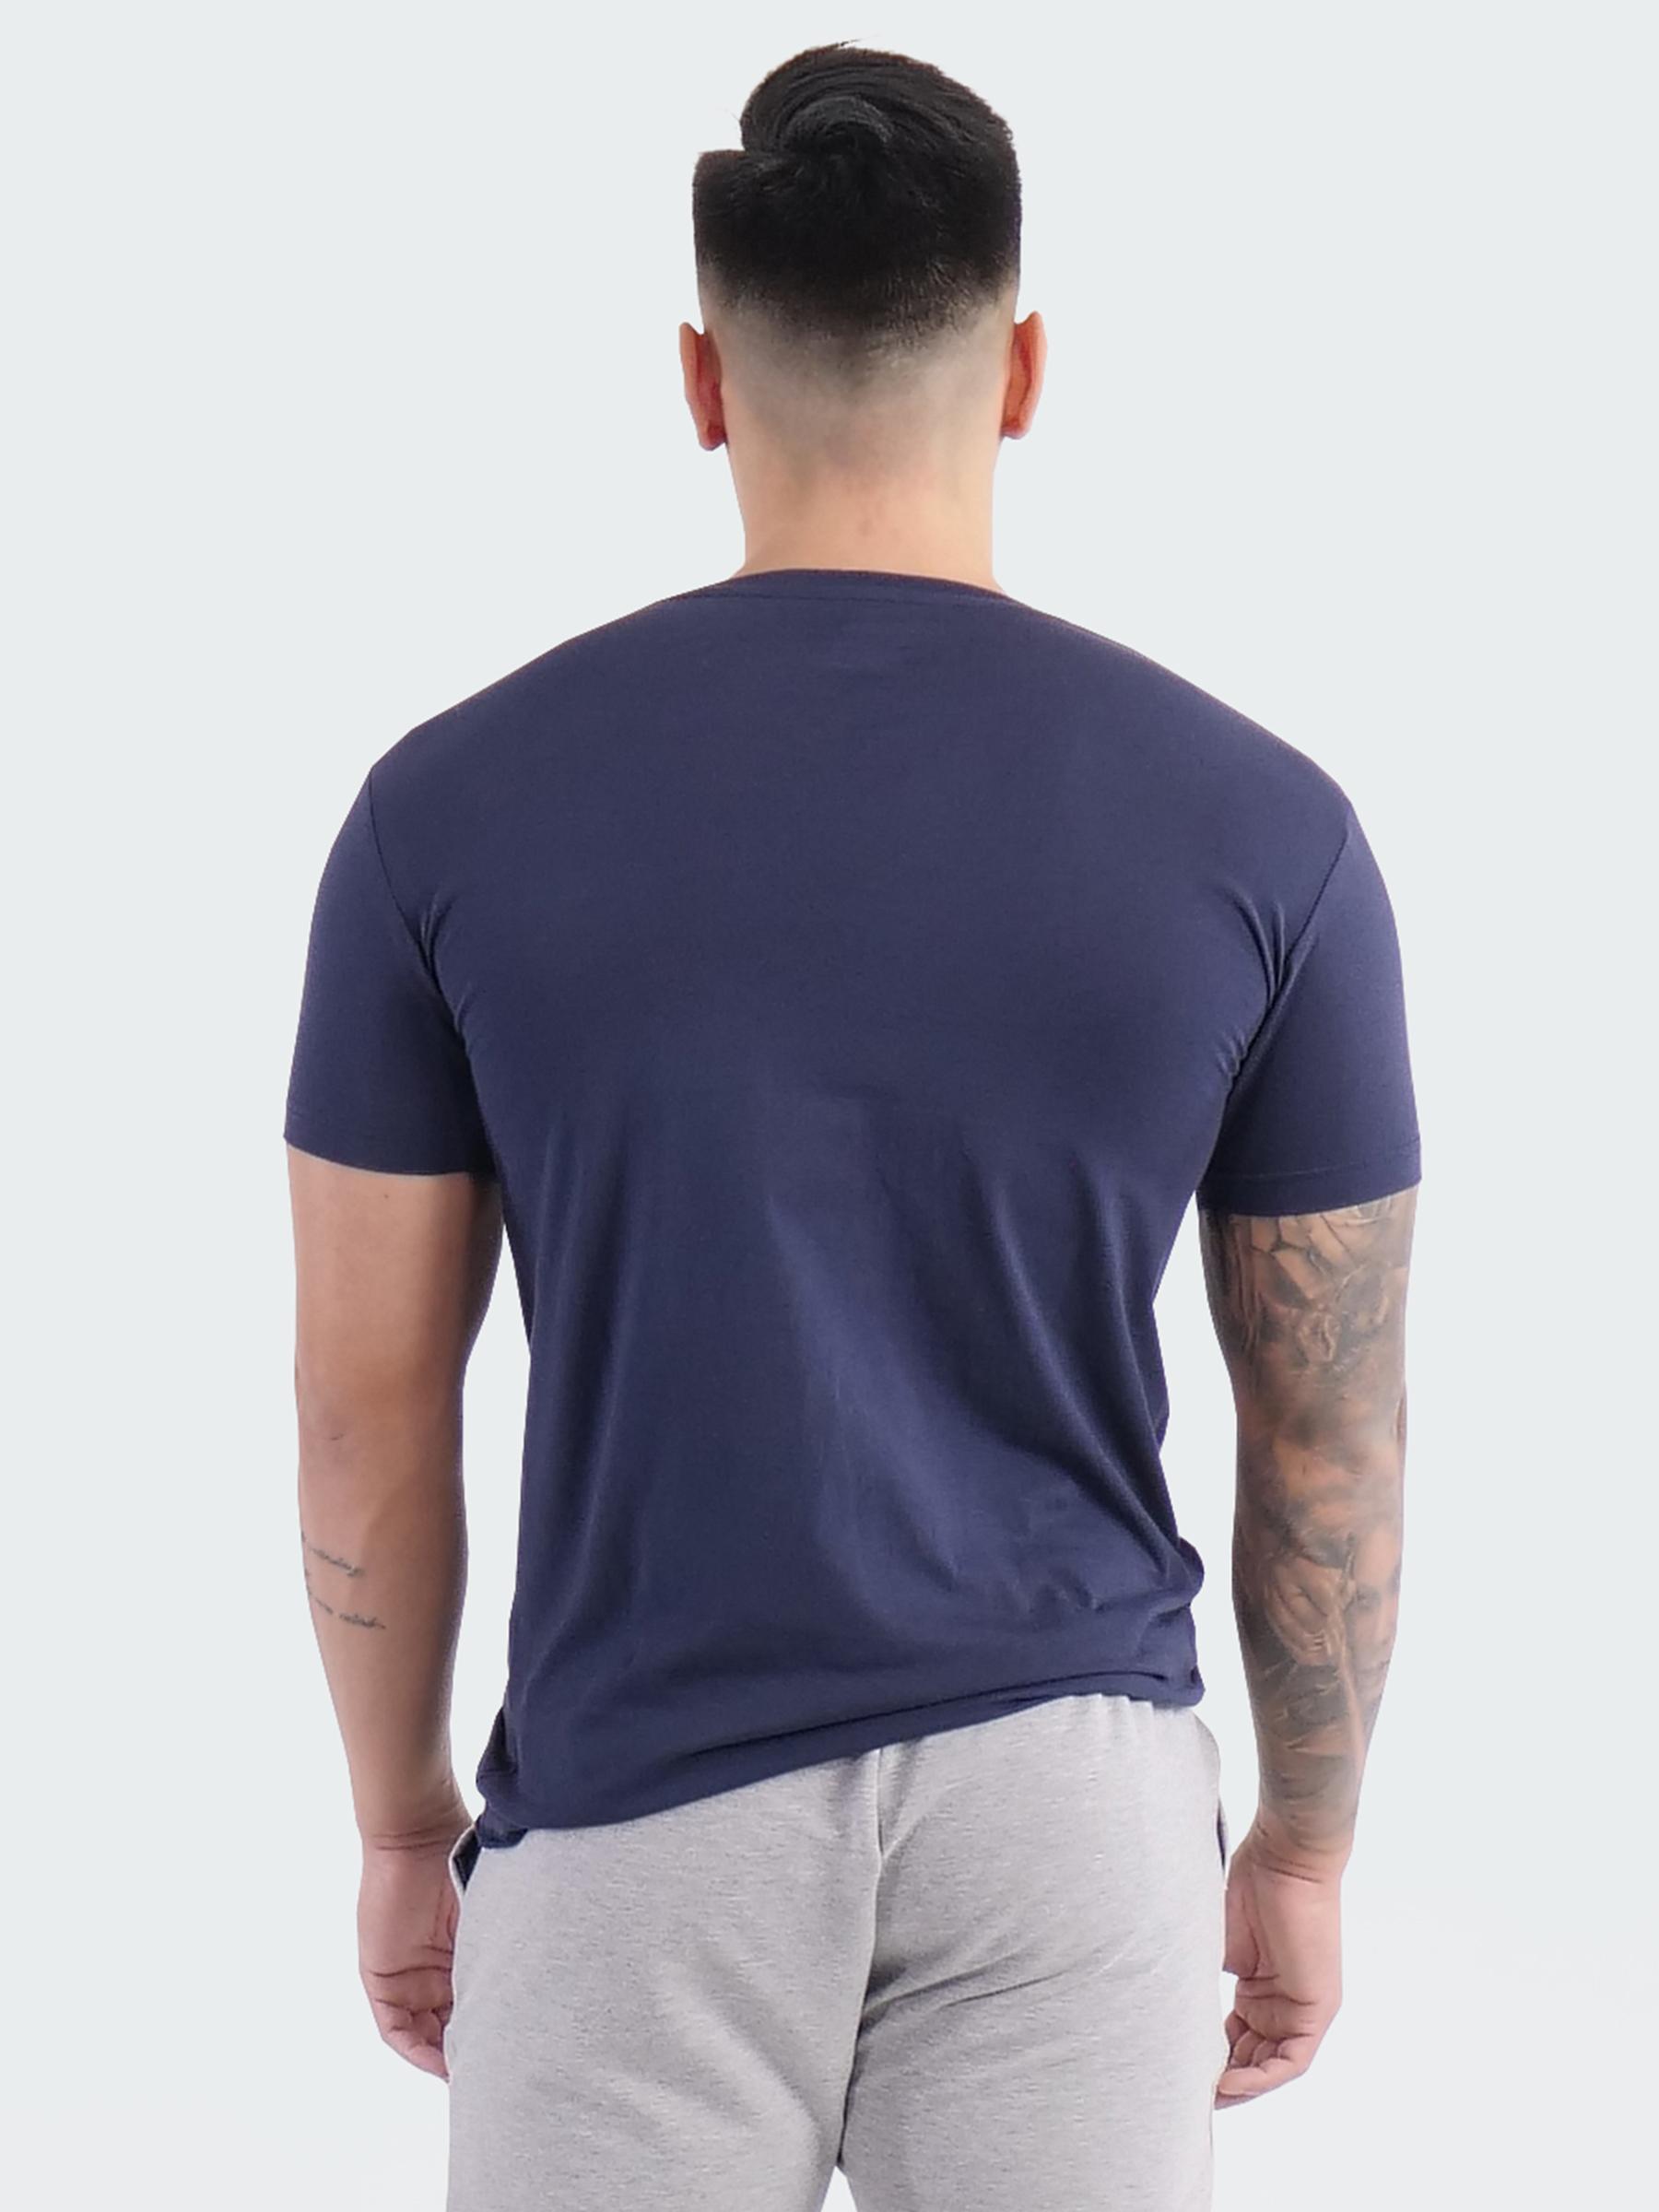 T-Shirt Logo Mens Navy Blue